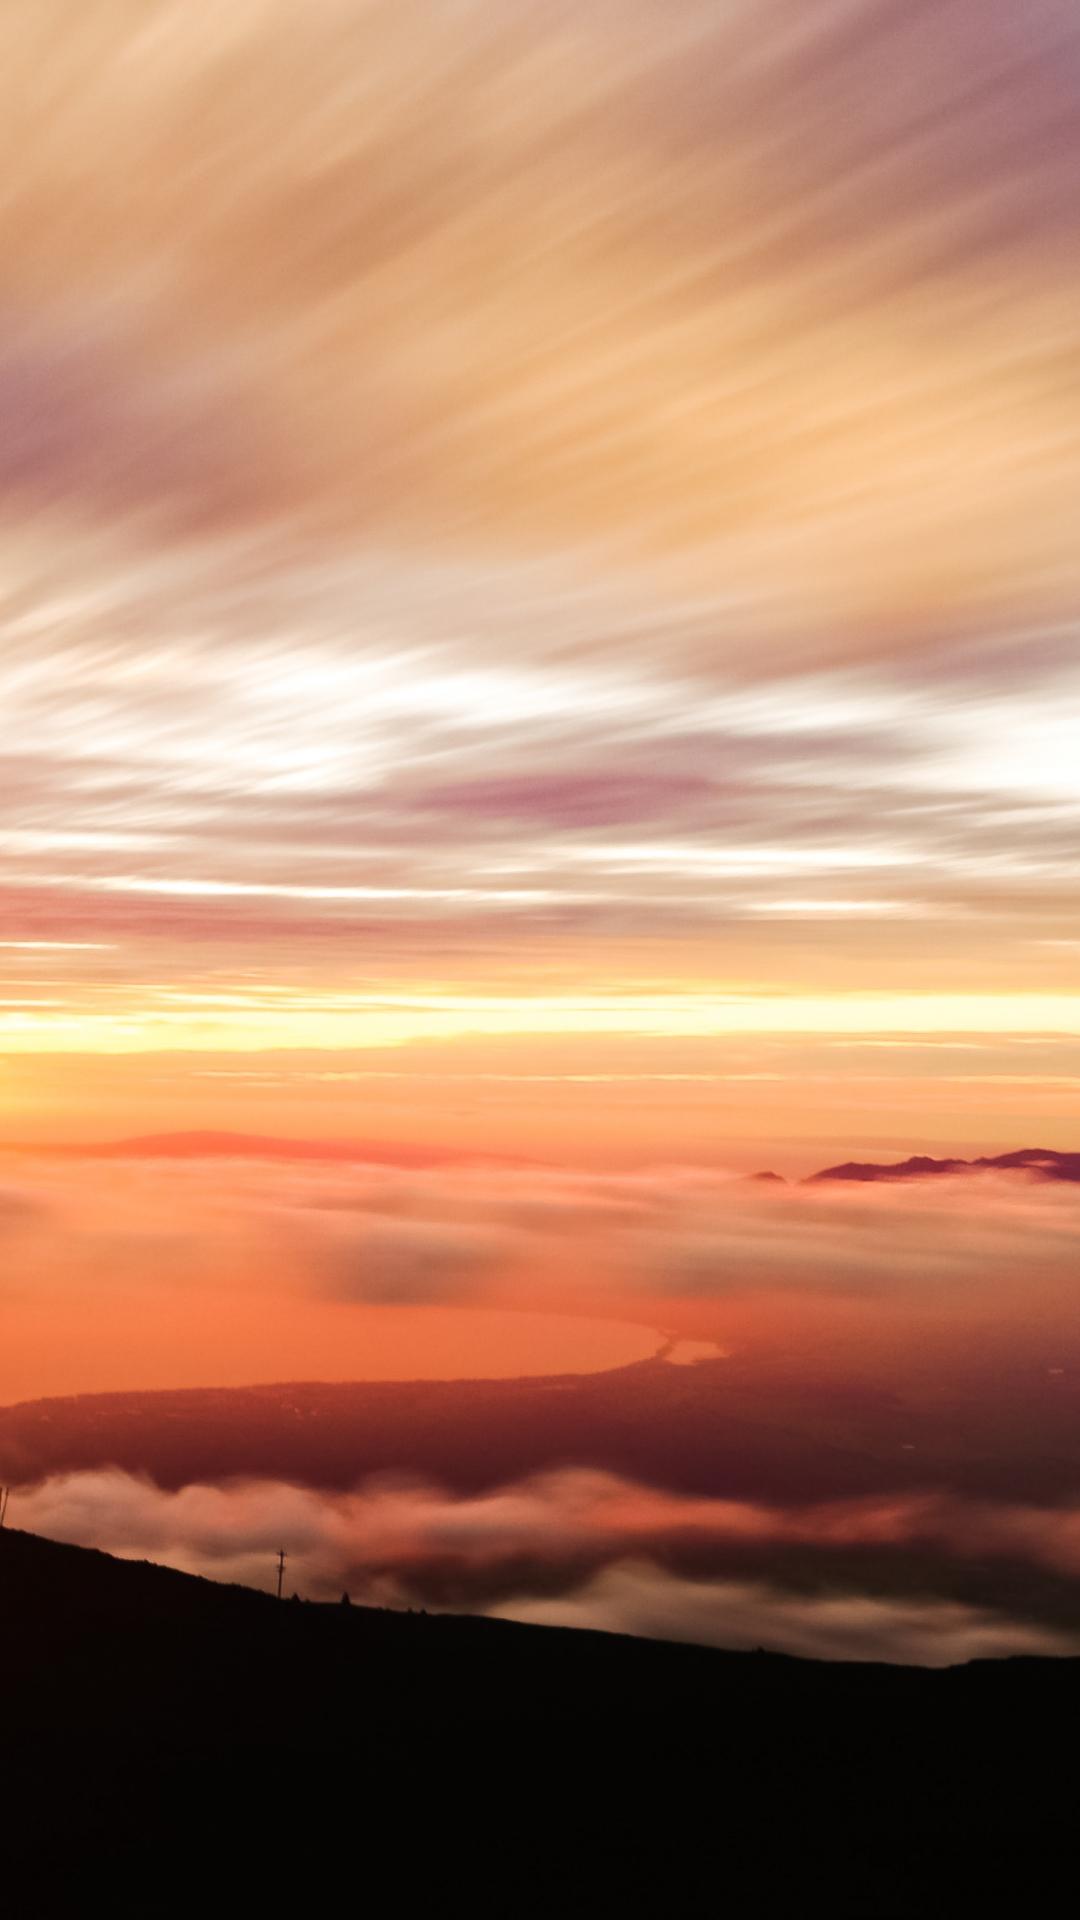 Vibrant Sunset iPhone Wallpaper